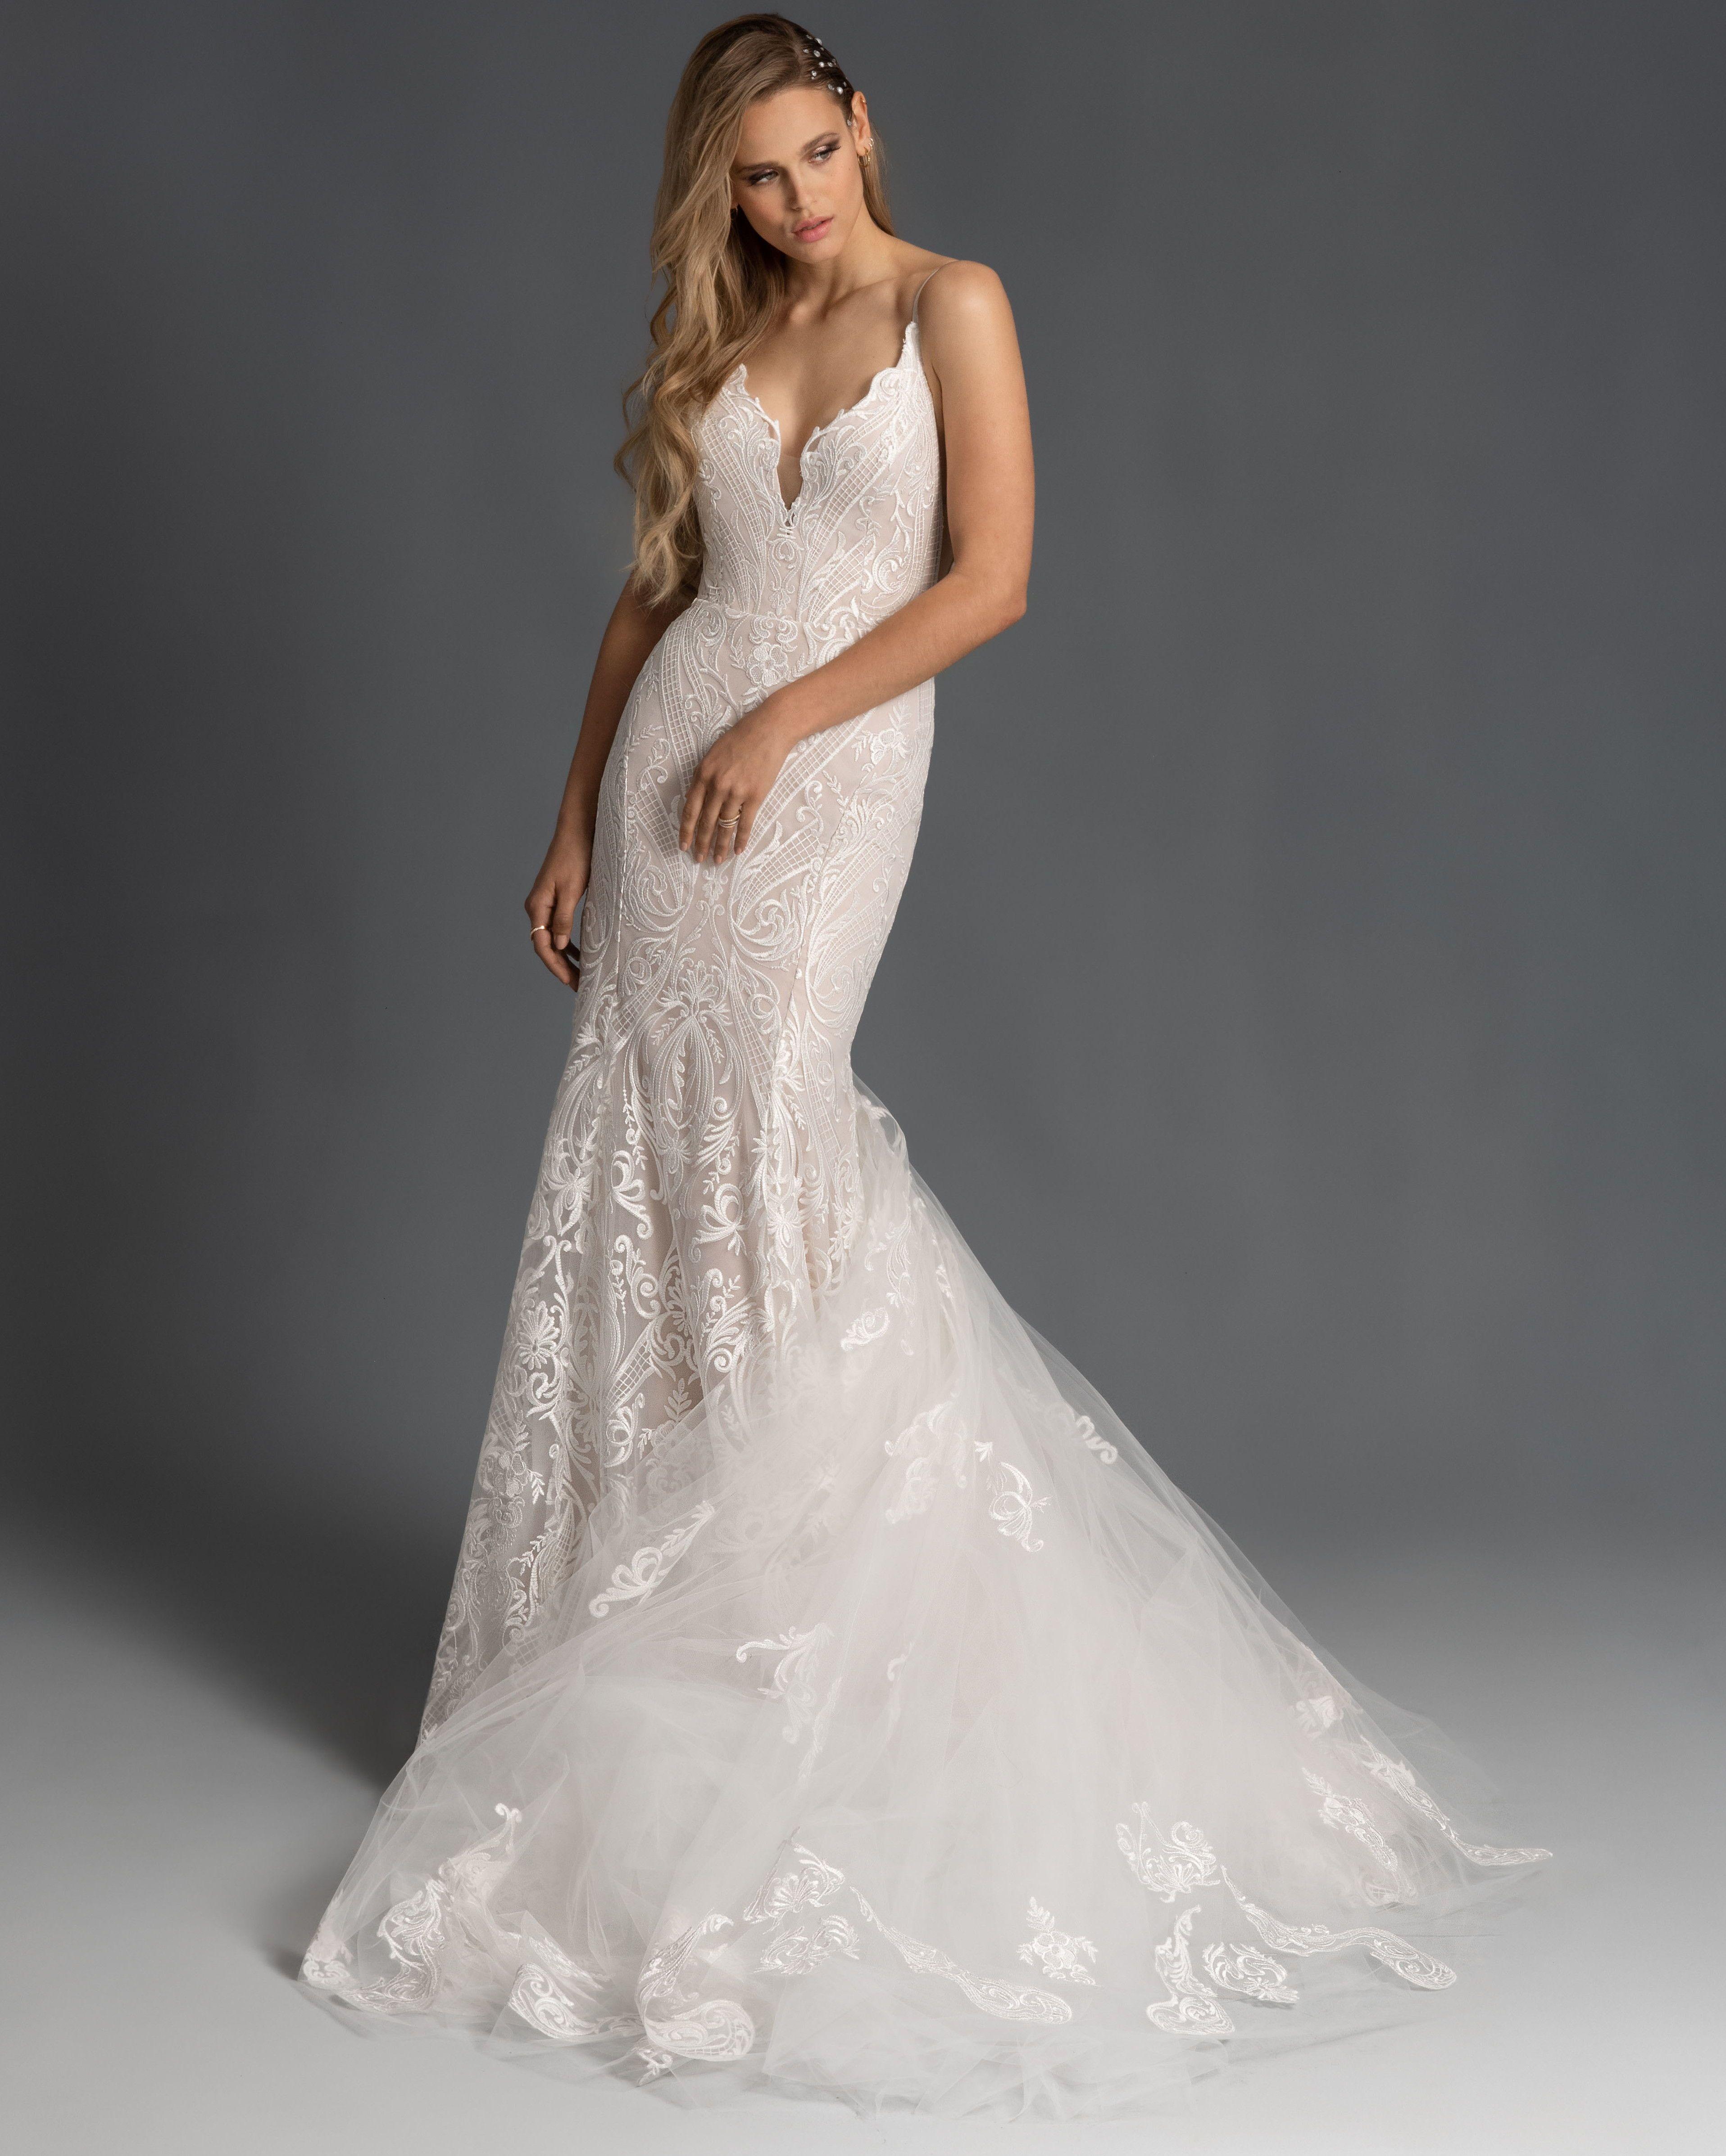 Hayley Paige Spring 2020 Zazu Embroidered Trumpet Wedding Dress With Scalloped Sweetheart Ne Sheath Wedding Dress Lace Wedding Dresses Wedding Dresses Blush